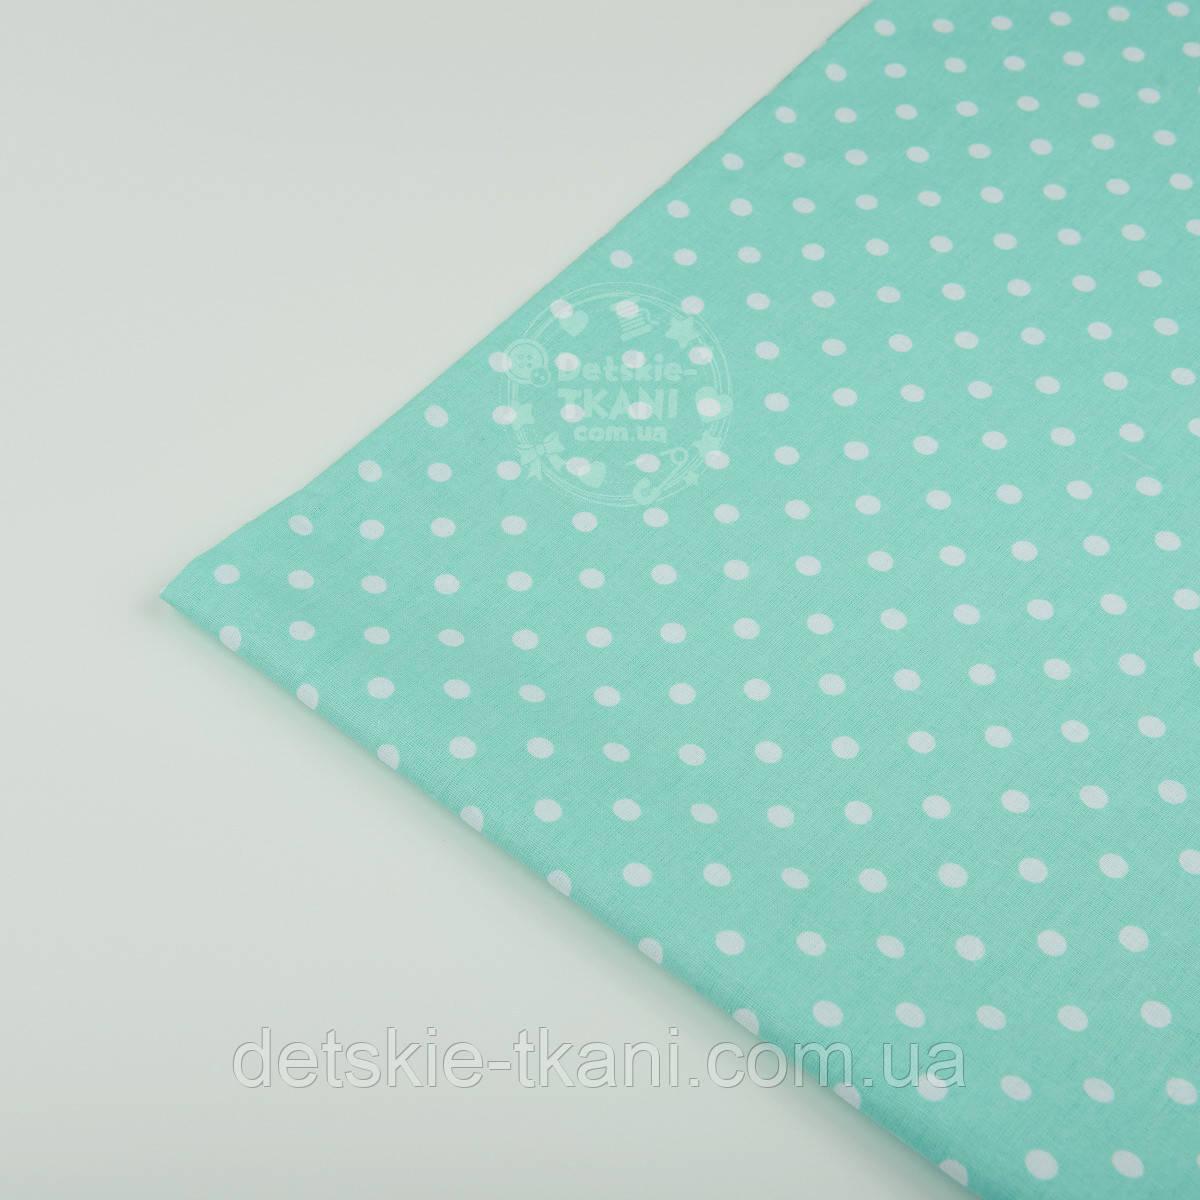 Лоскут ткани №43 с белым горошком на мятном фоне